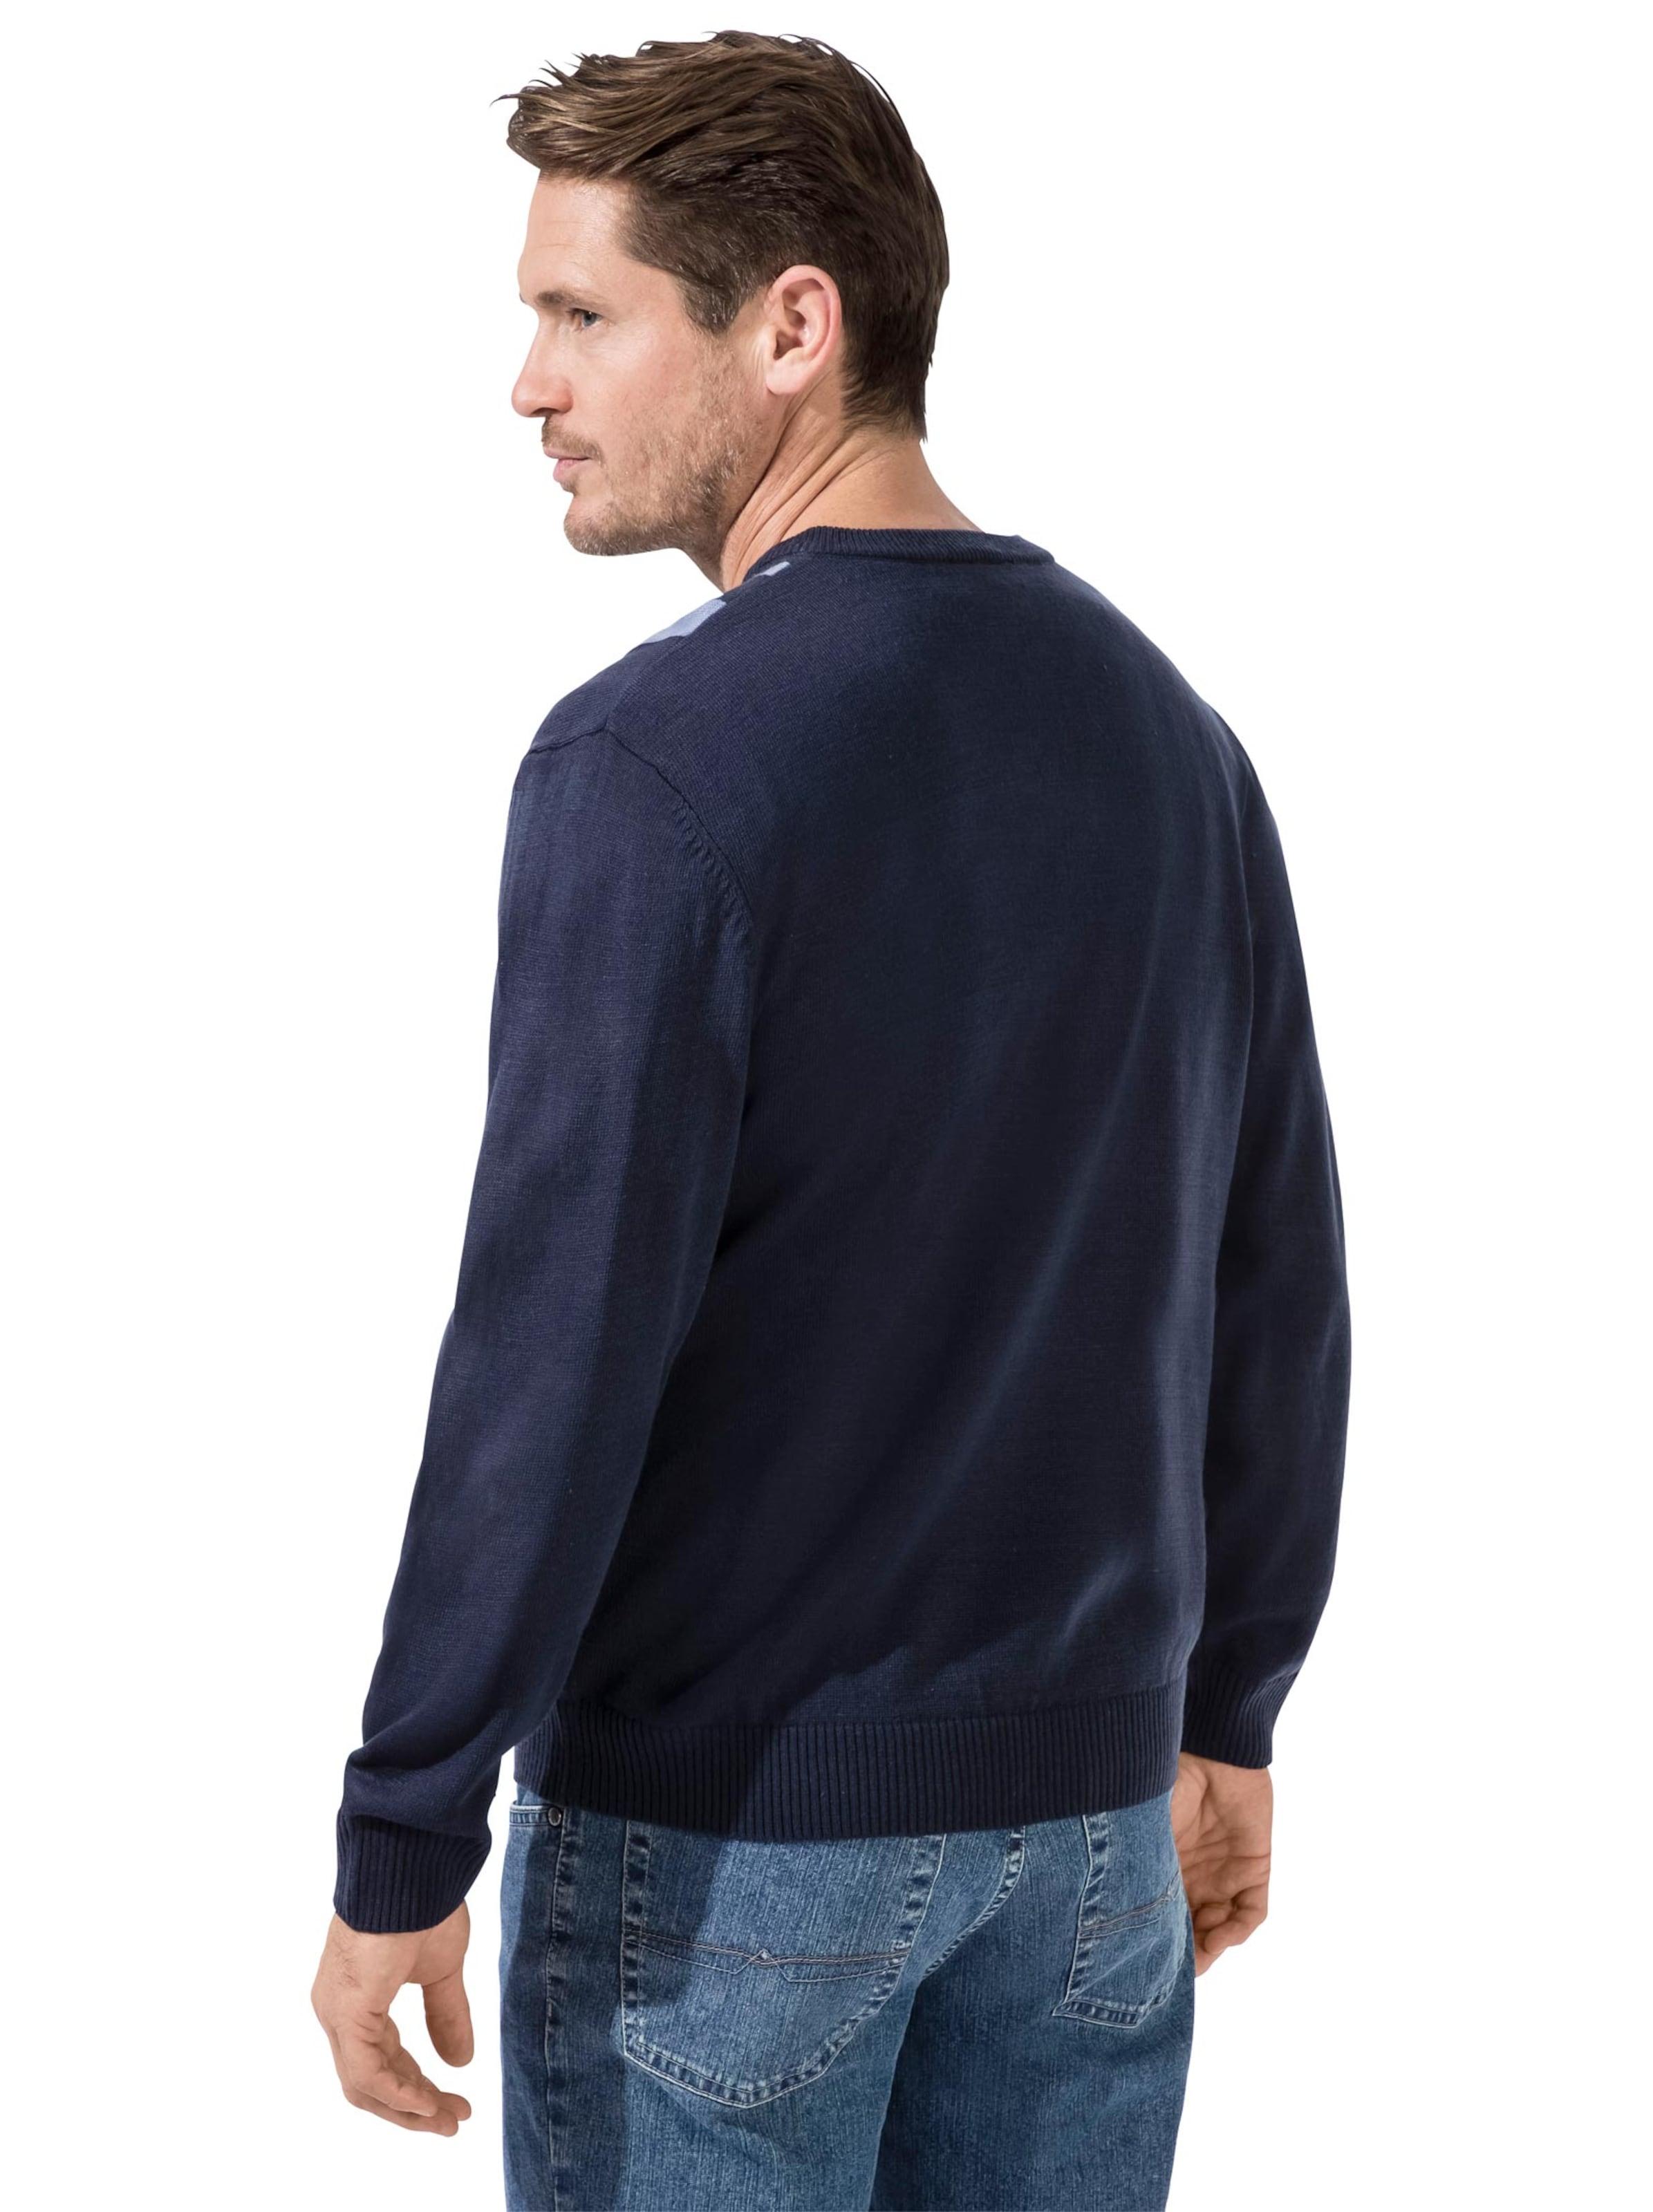 witt weiden - Herren Pullover marine